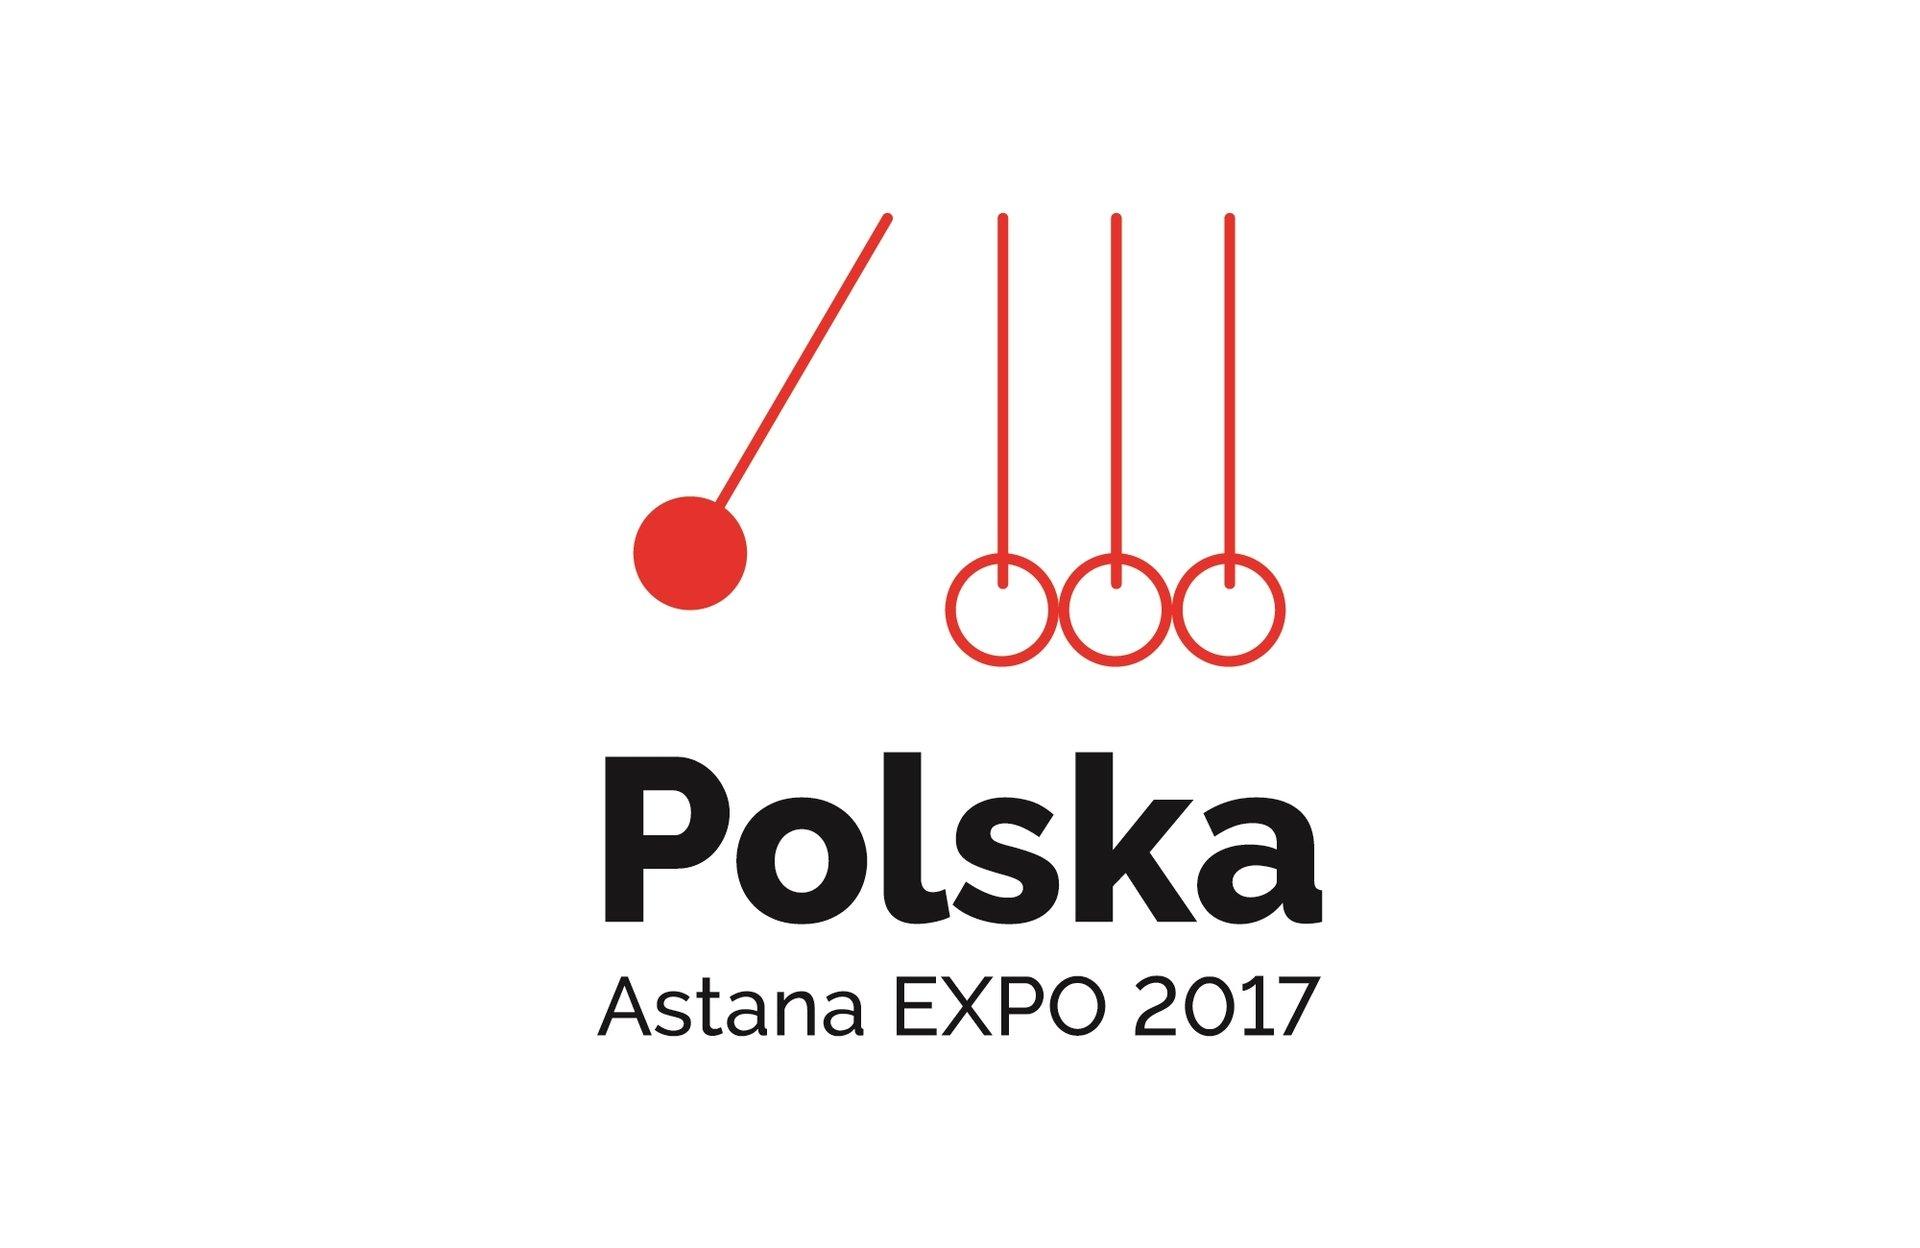 Polskie meble po raz pierwszy na EXPO